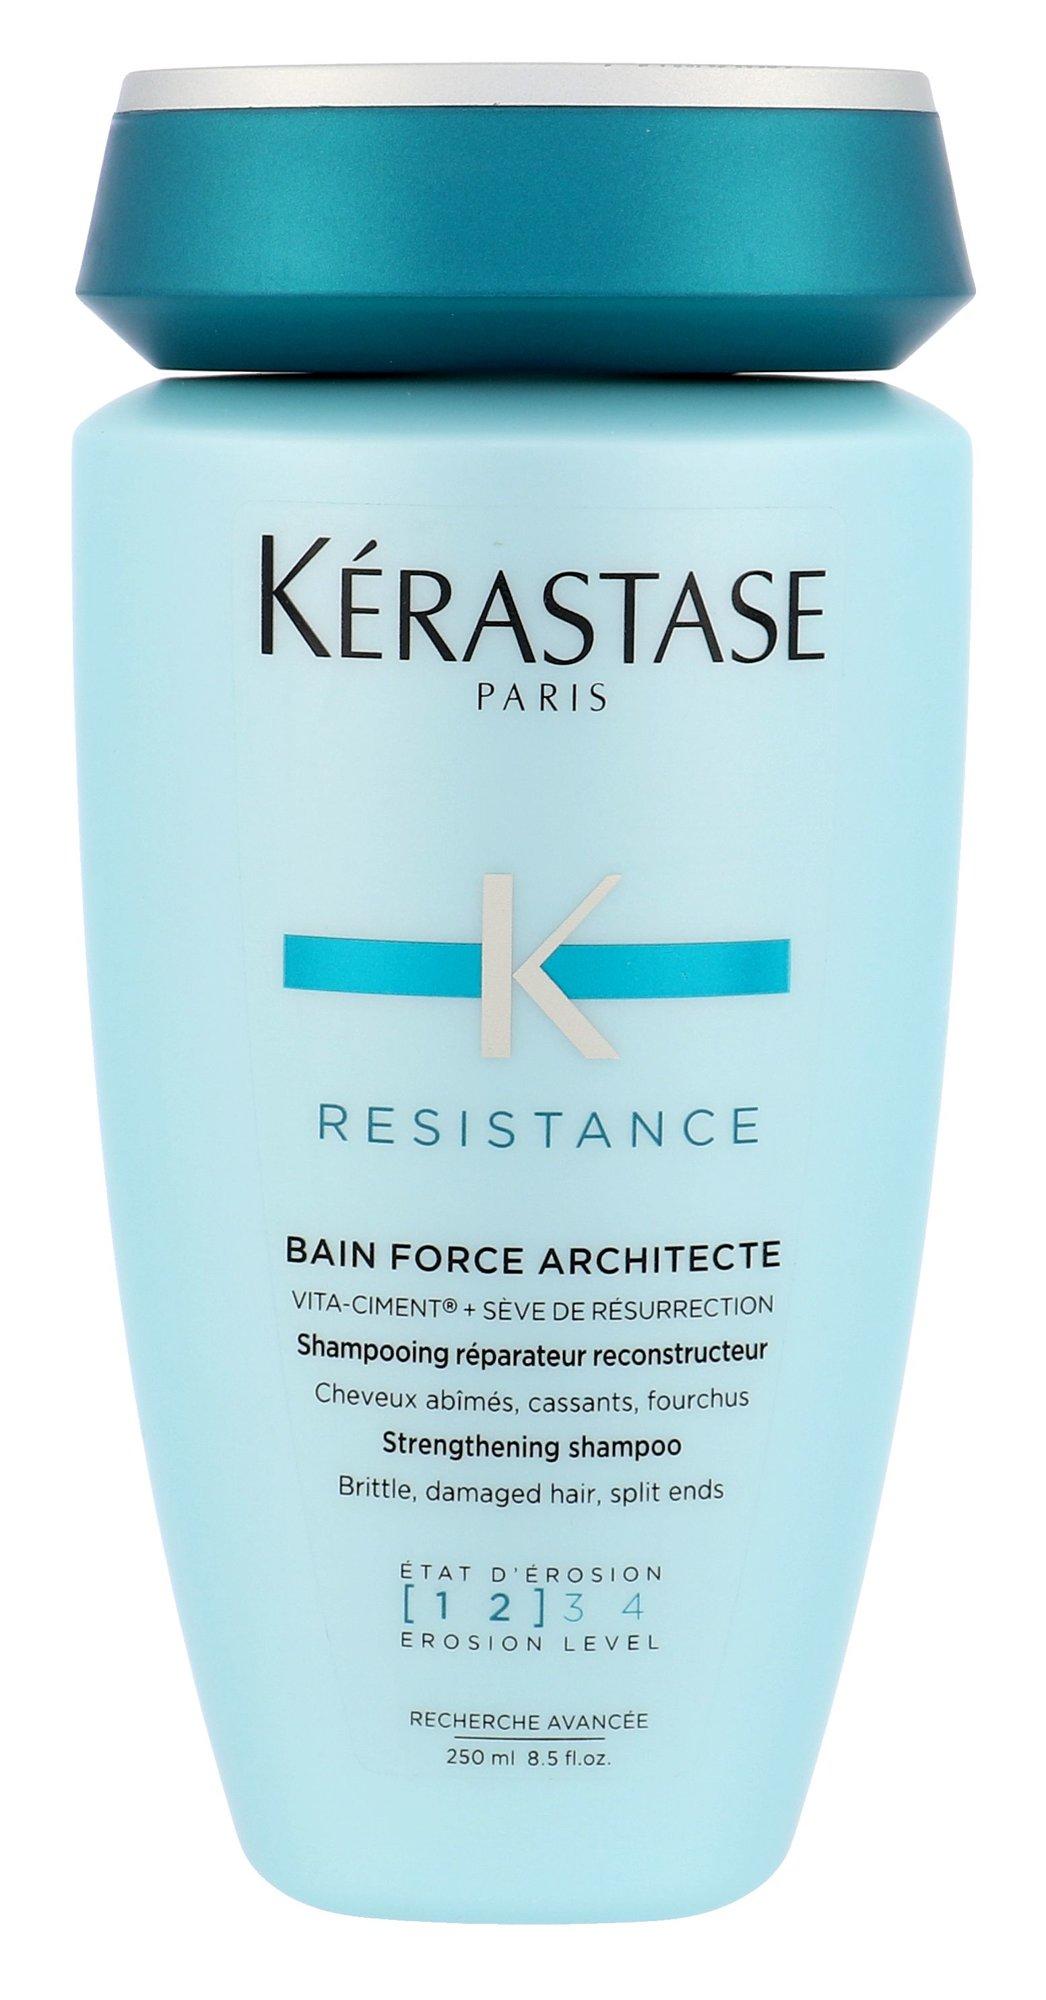 Kérastase Résistance Cosmetic 250ml  Bain De Force Architecte